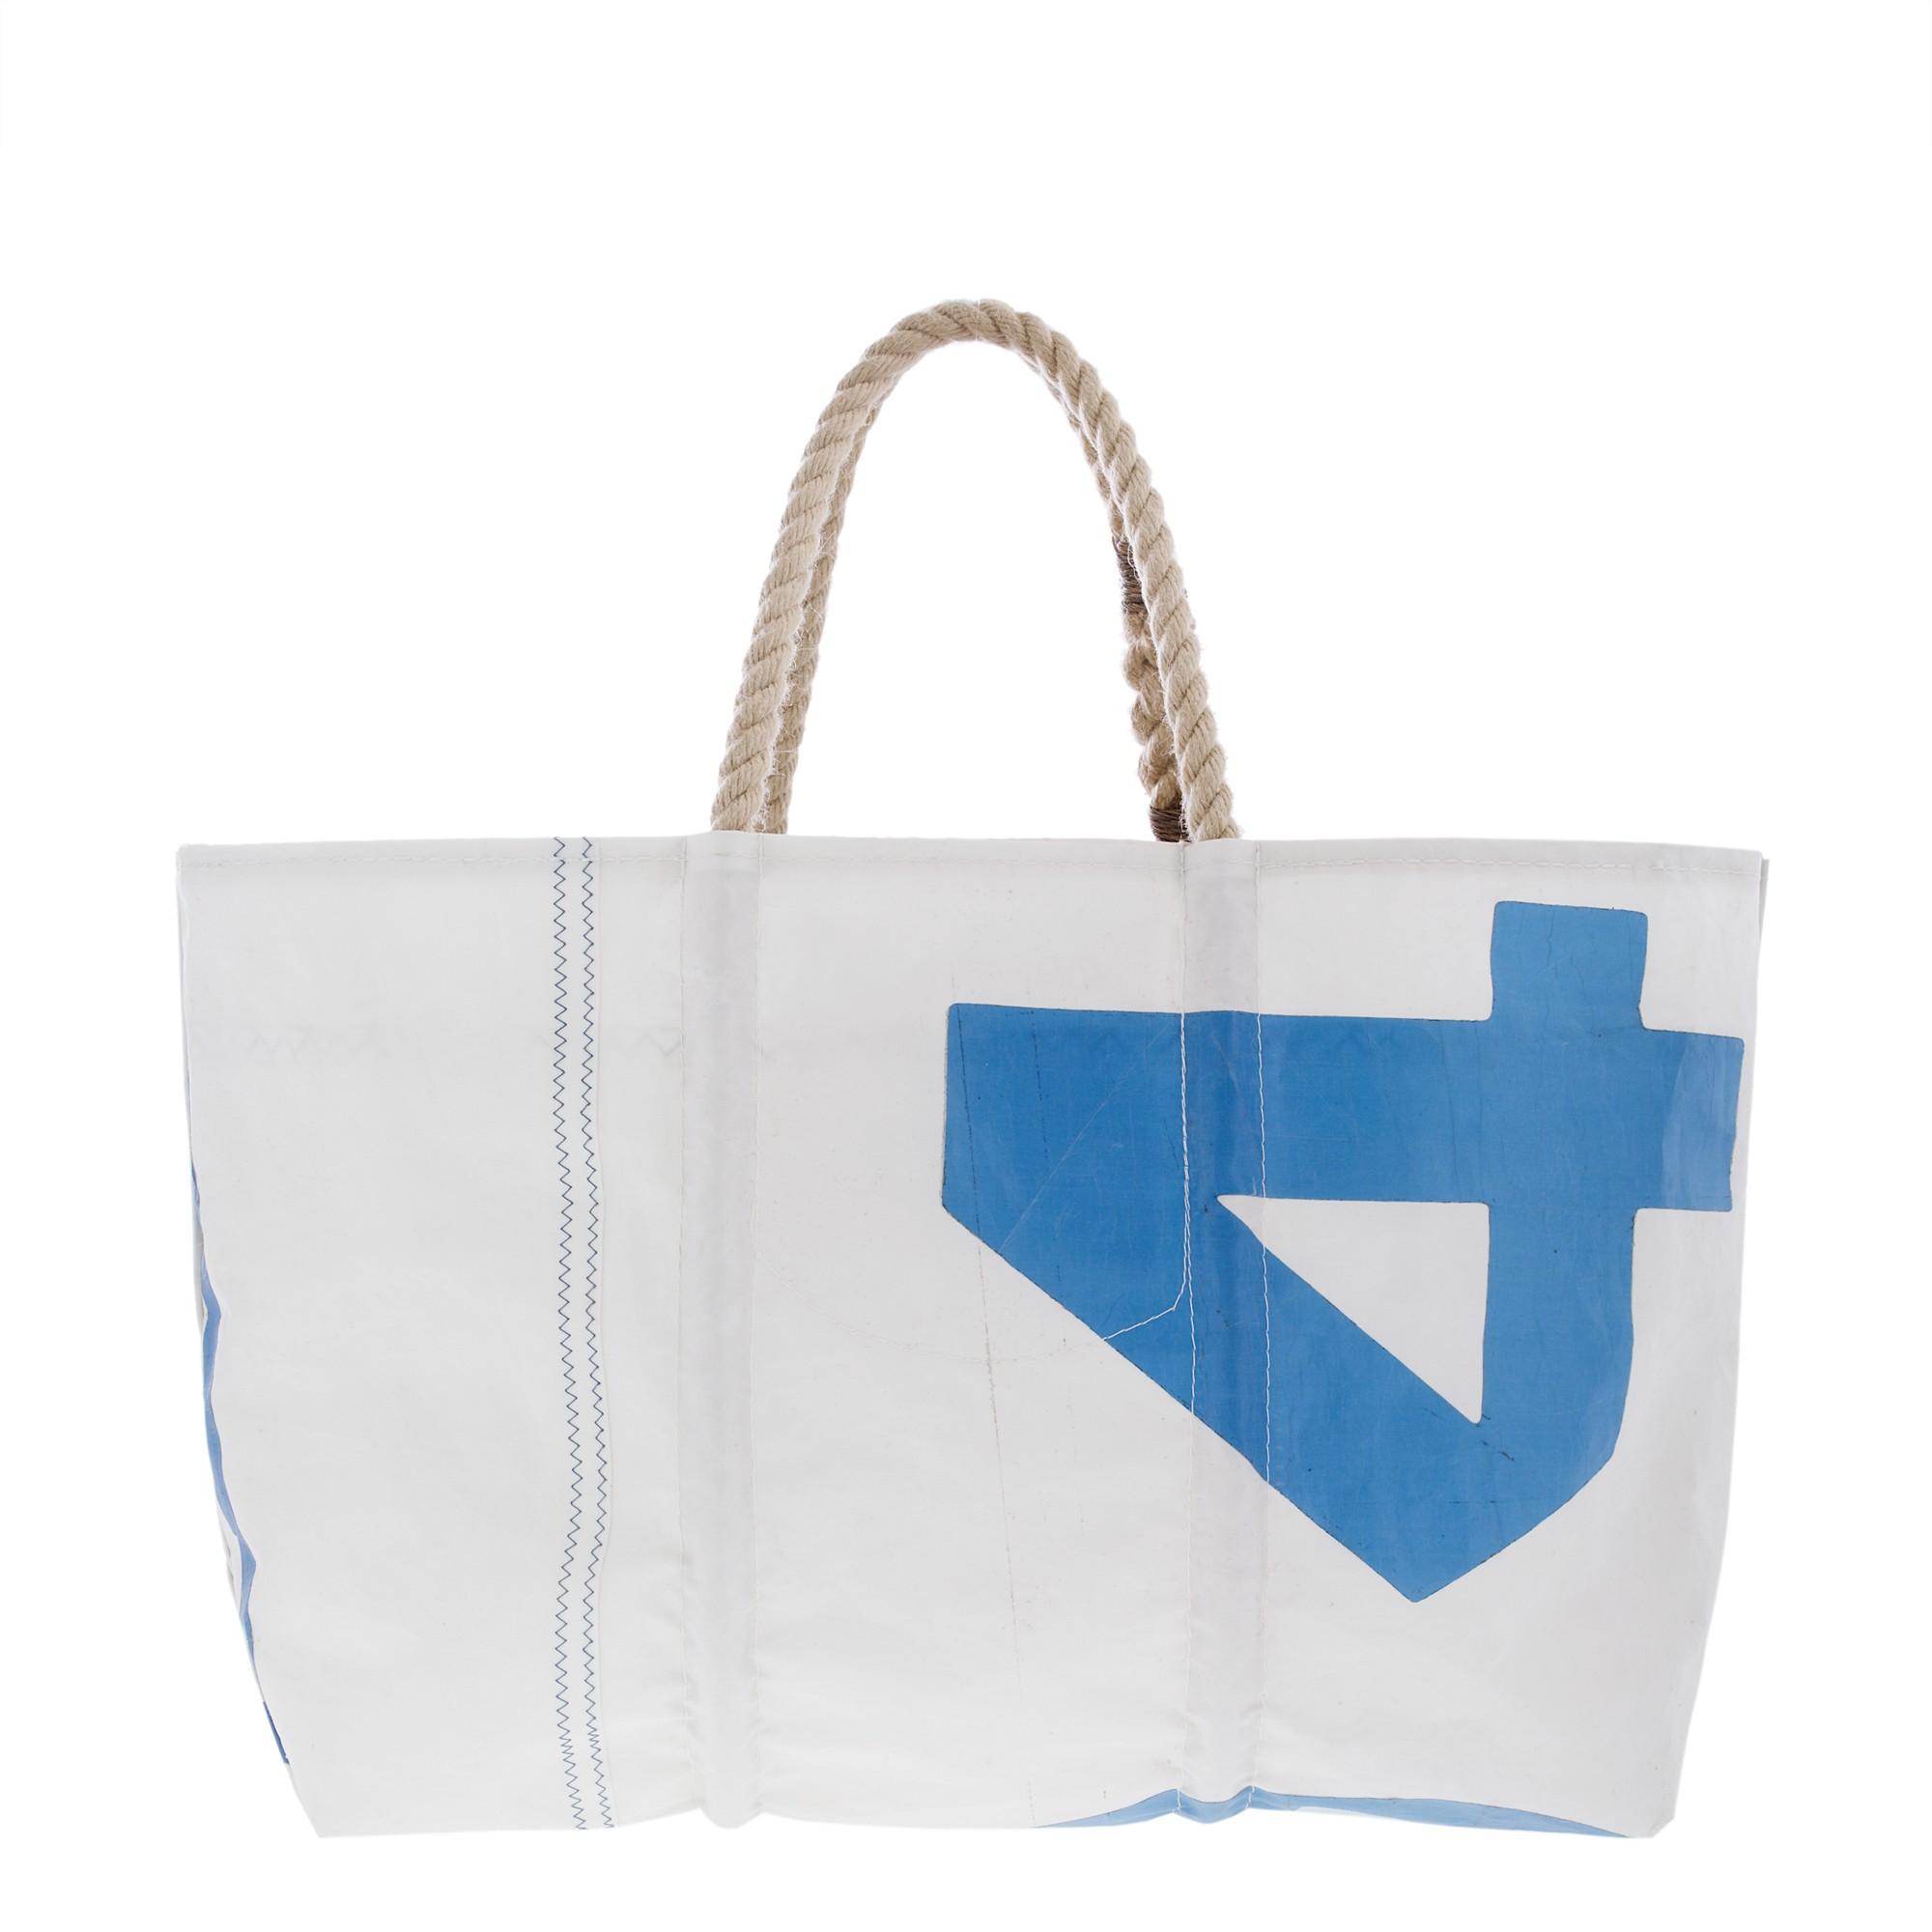 Sea Bags For Jcrew Indigo Collection Tote